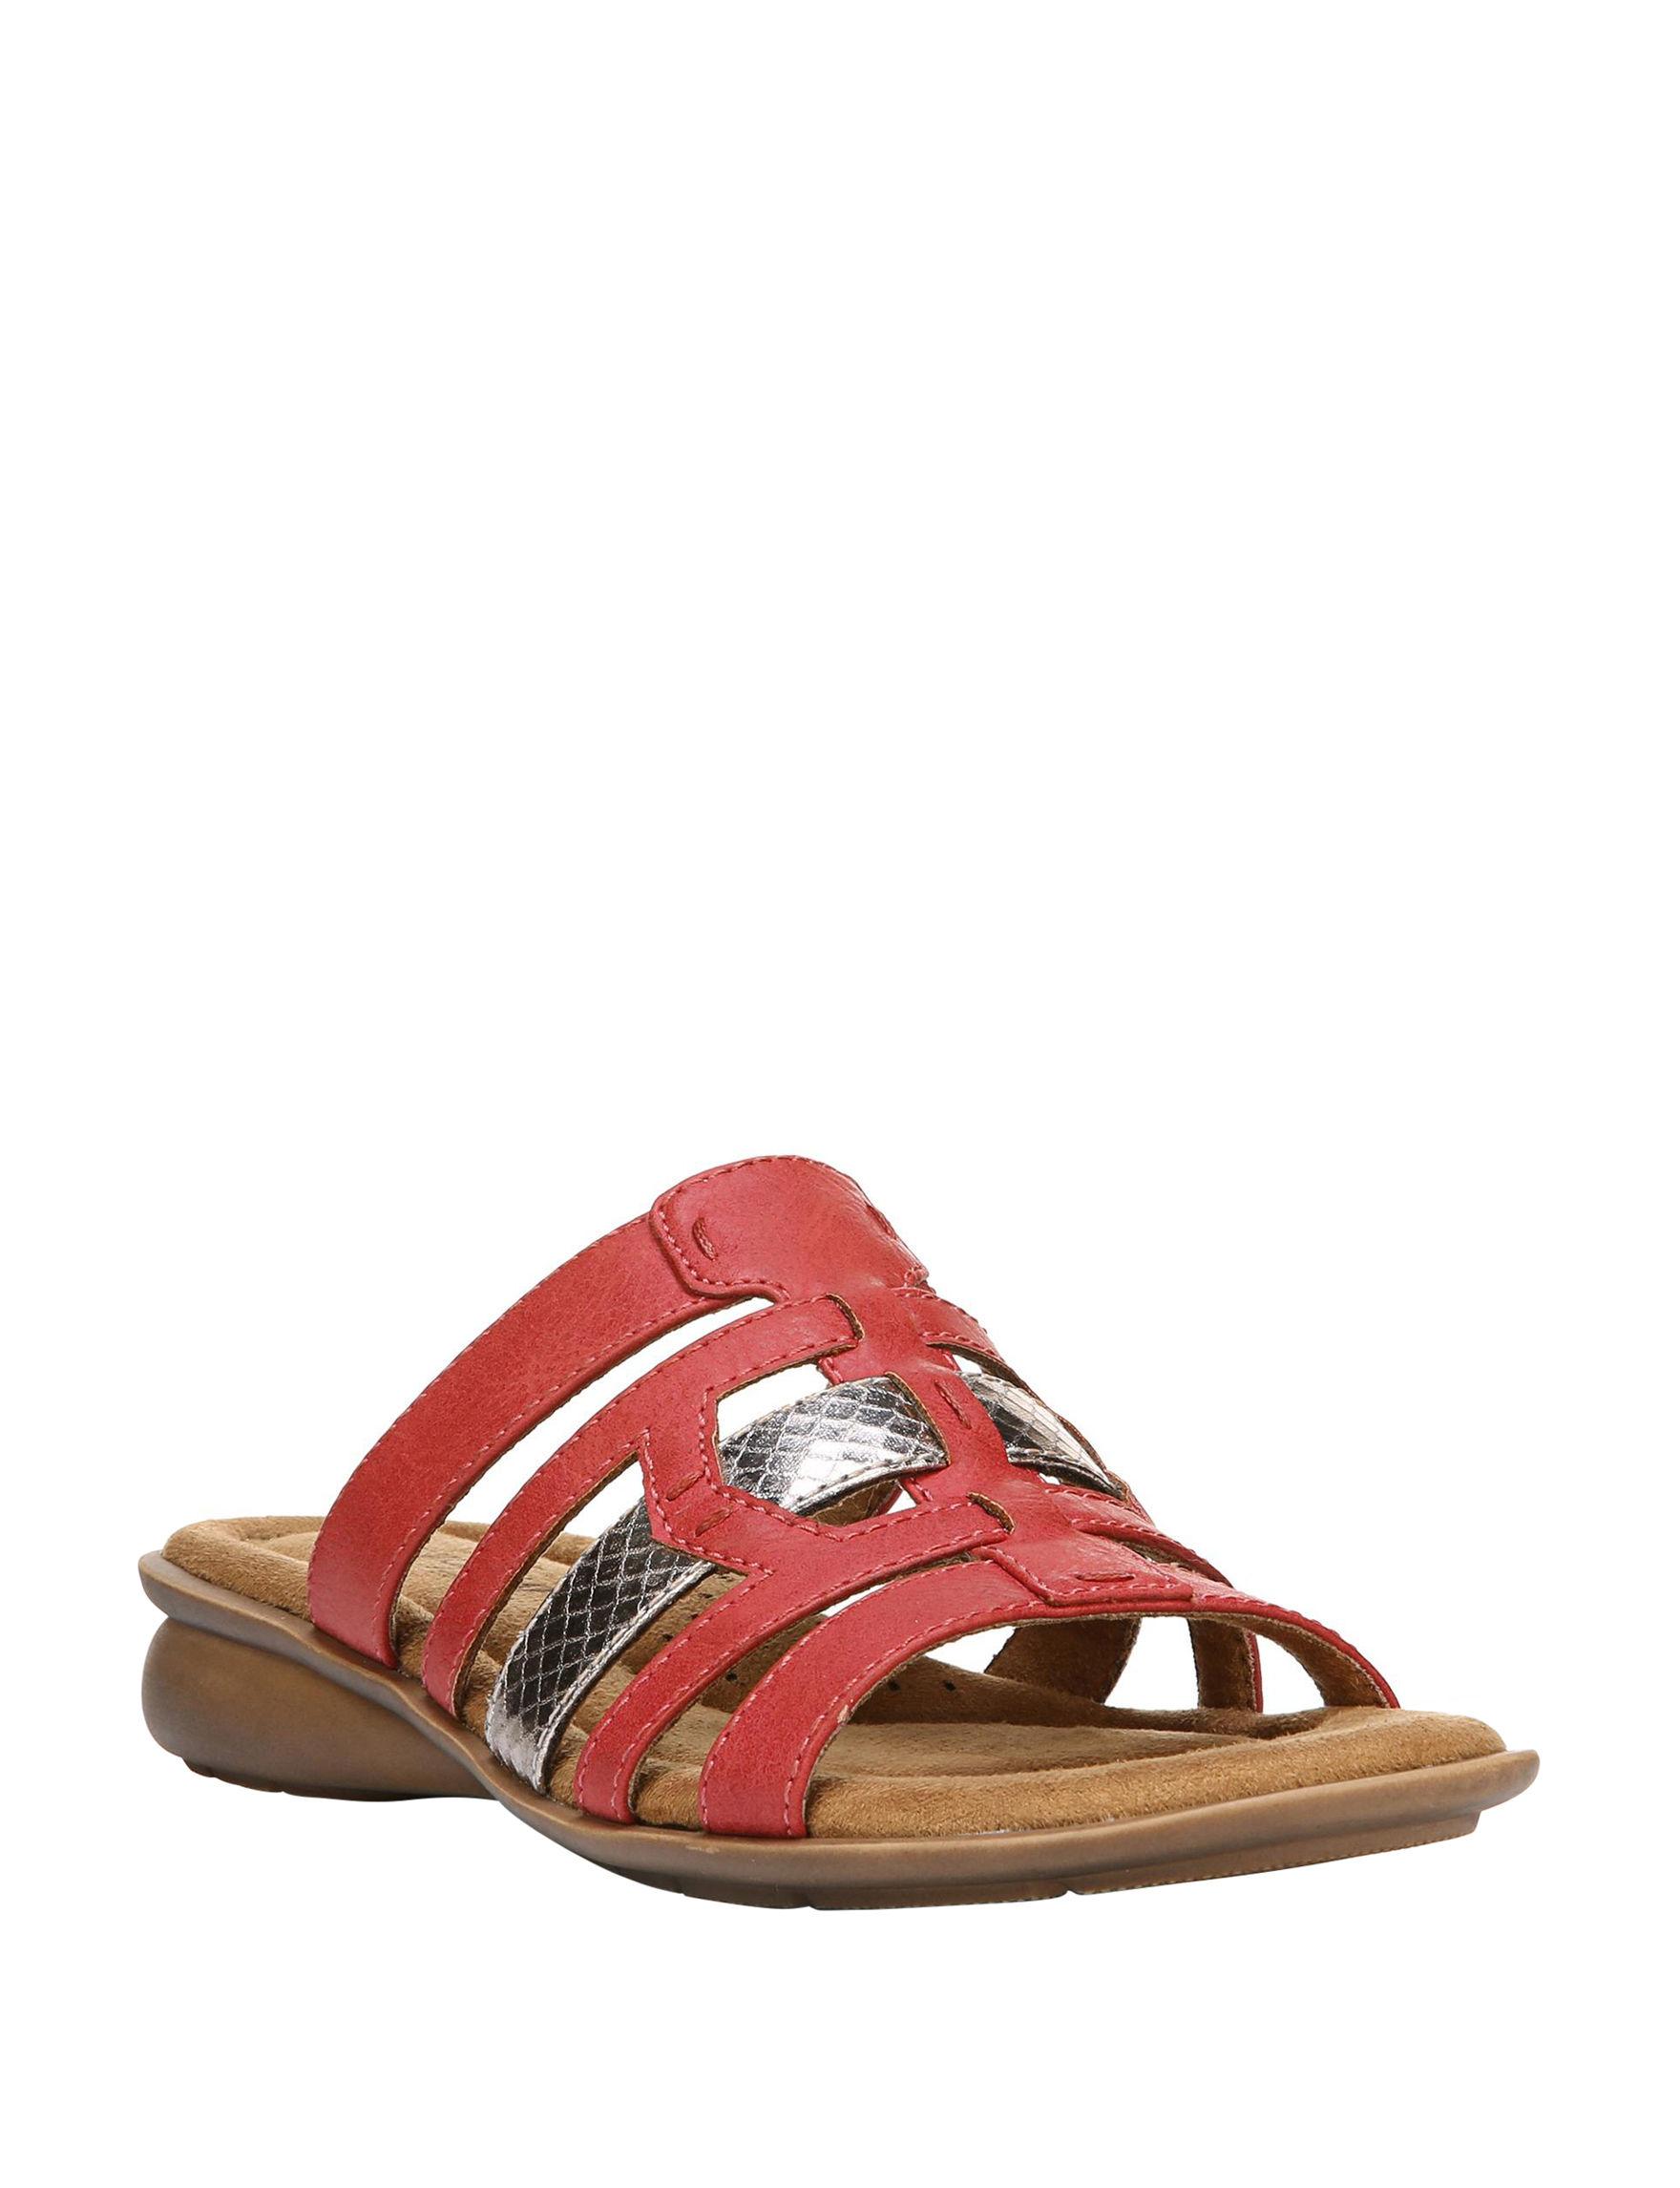 Natural Soul Red Flat Sandals